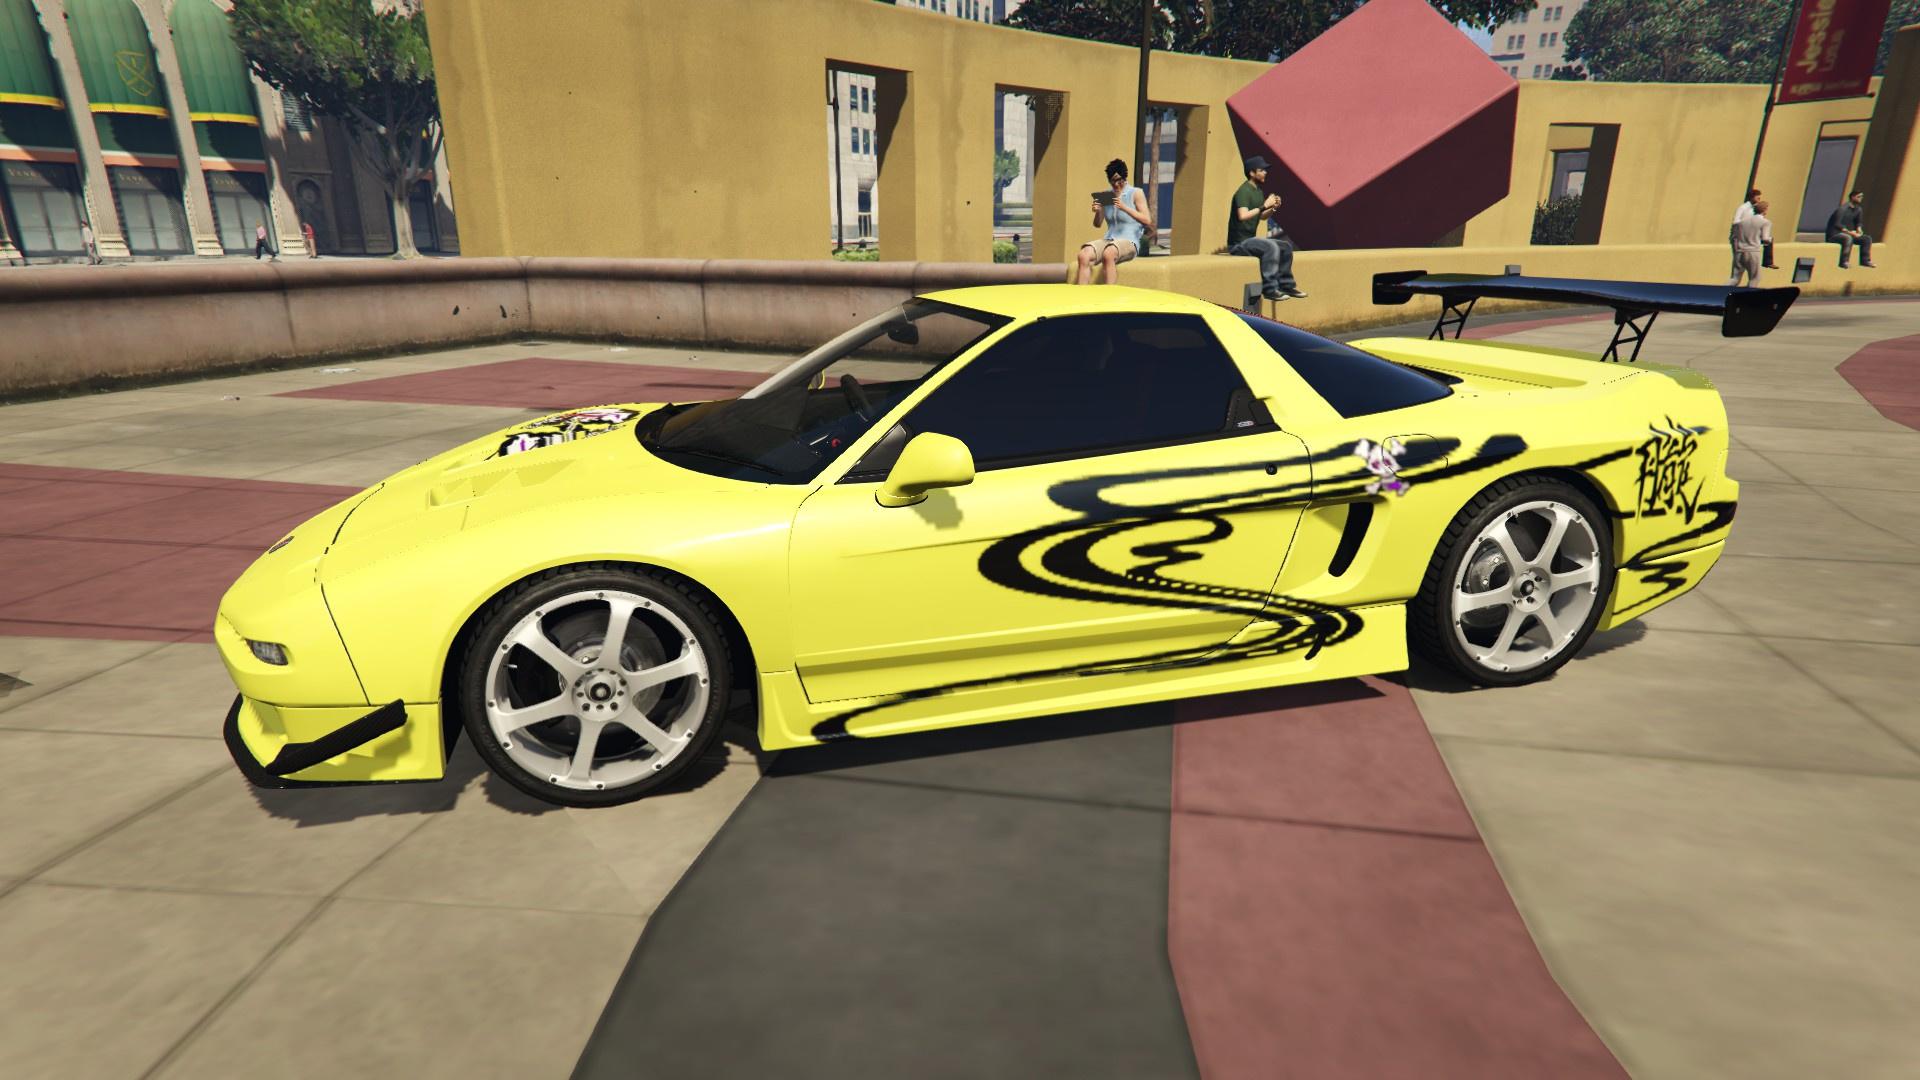 tokyo xtreme racer drift